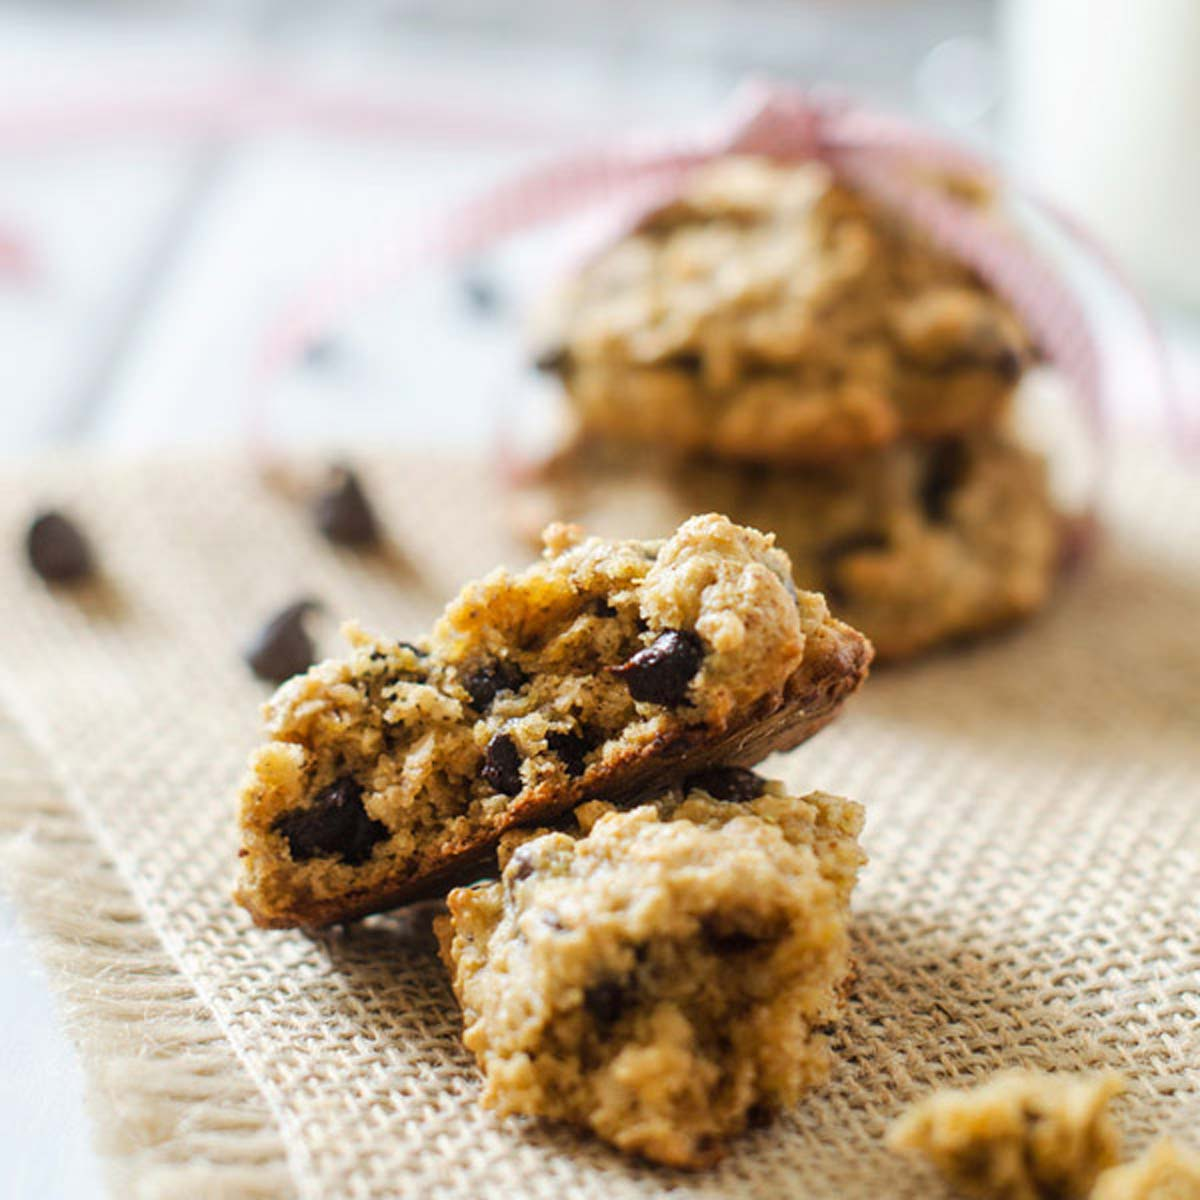 Square close up photo of chocolate chip quinoa cookies on burlap.